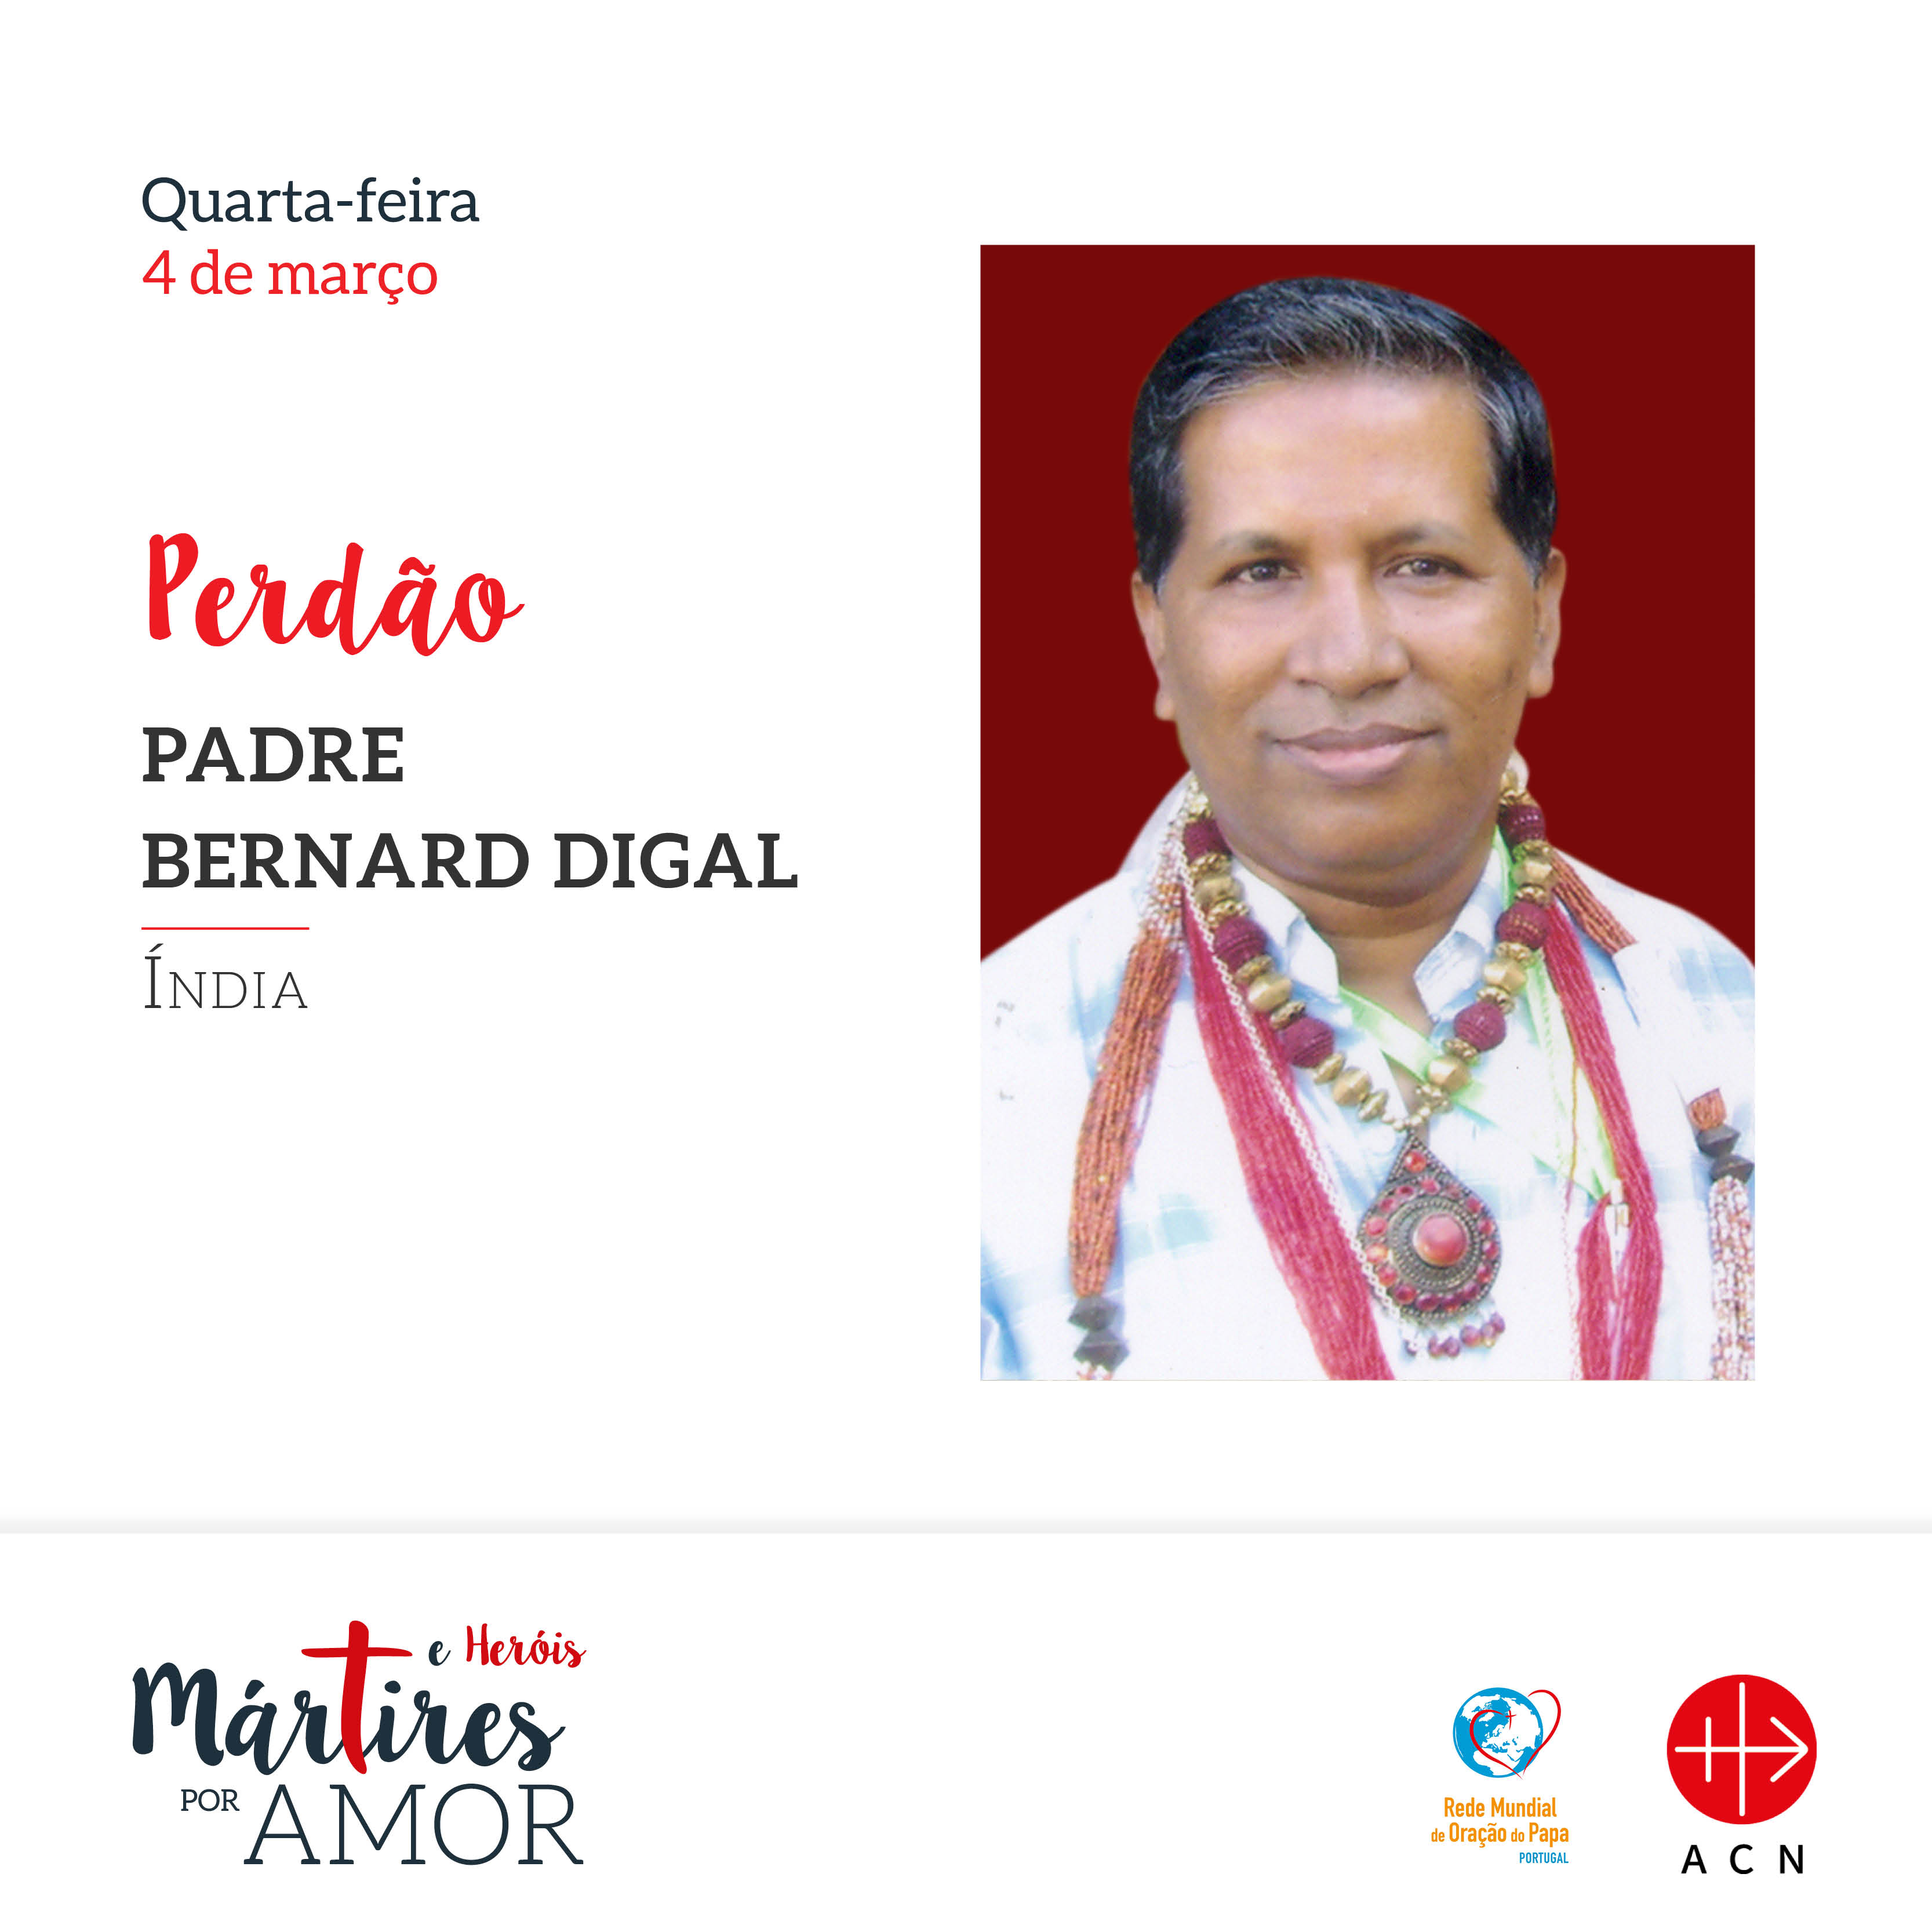 PERDÃO - Índia: Padre Bernard Digal